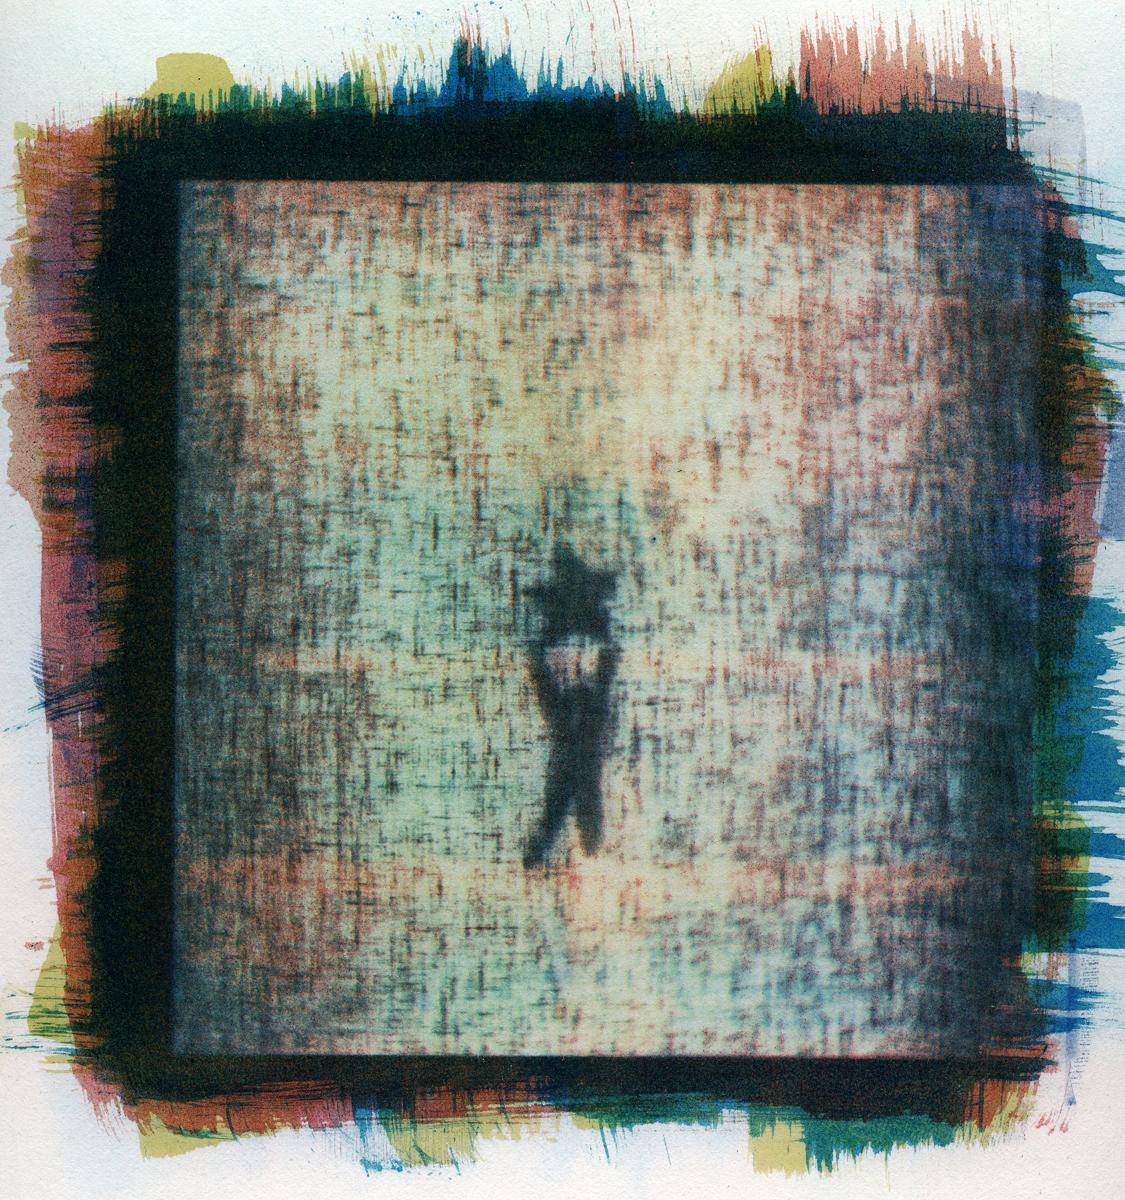 Arista Slater-Sandoval  Gum Bichromate, Cyanotype print  10 x 10 inches  $400  slater-sandoval_arista_4,, entry #223   www.aristaslatersandoval.com